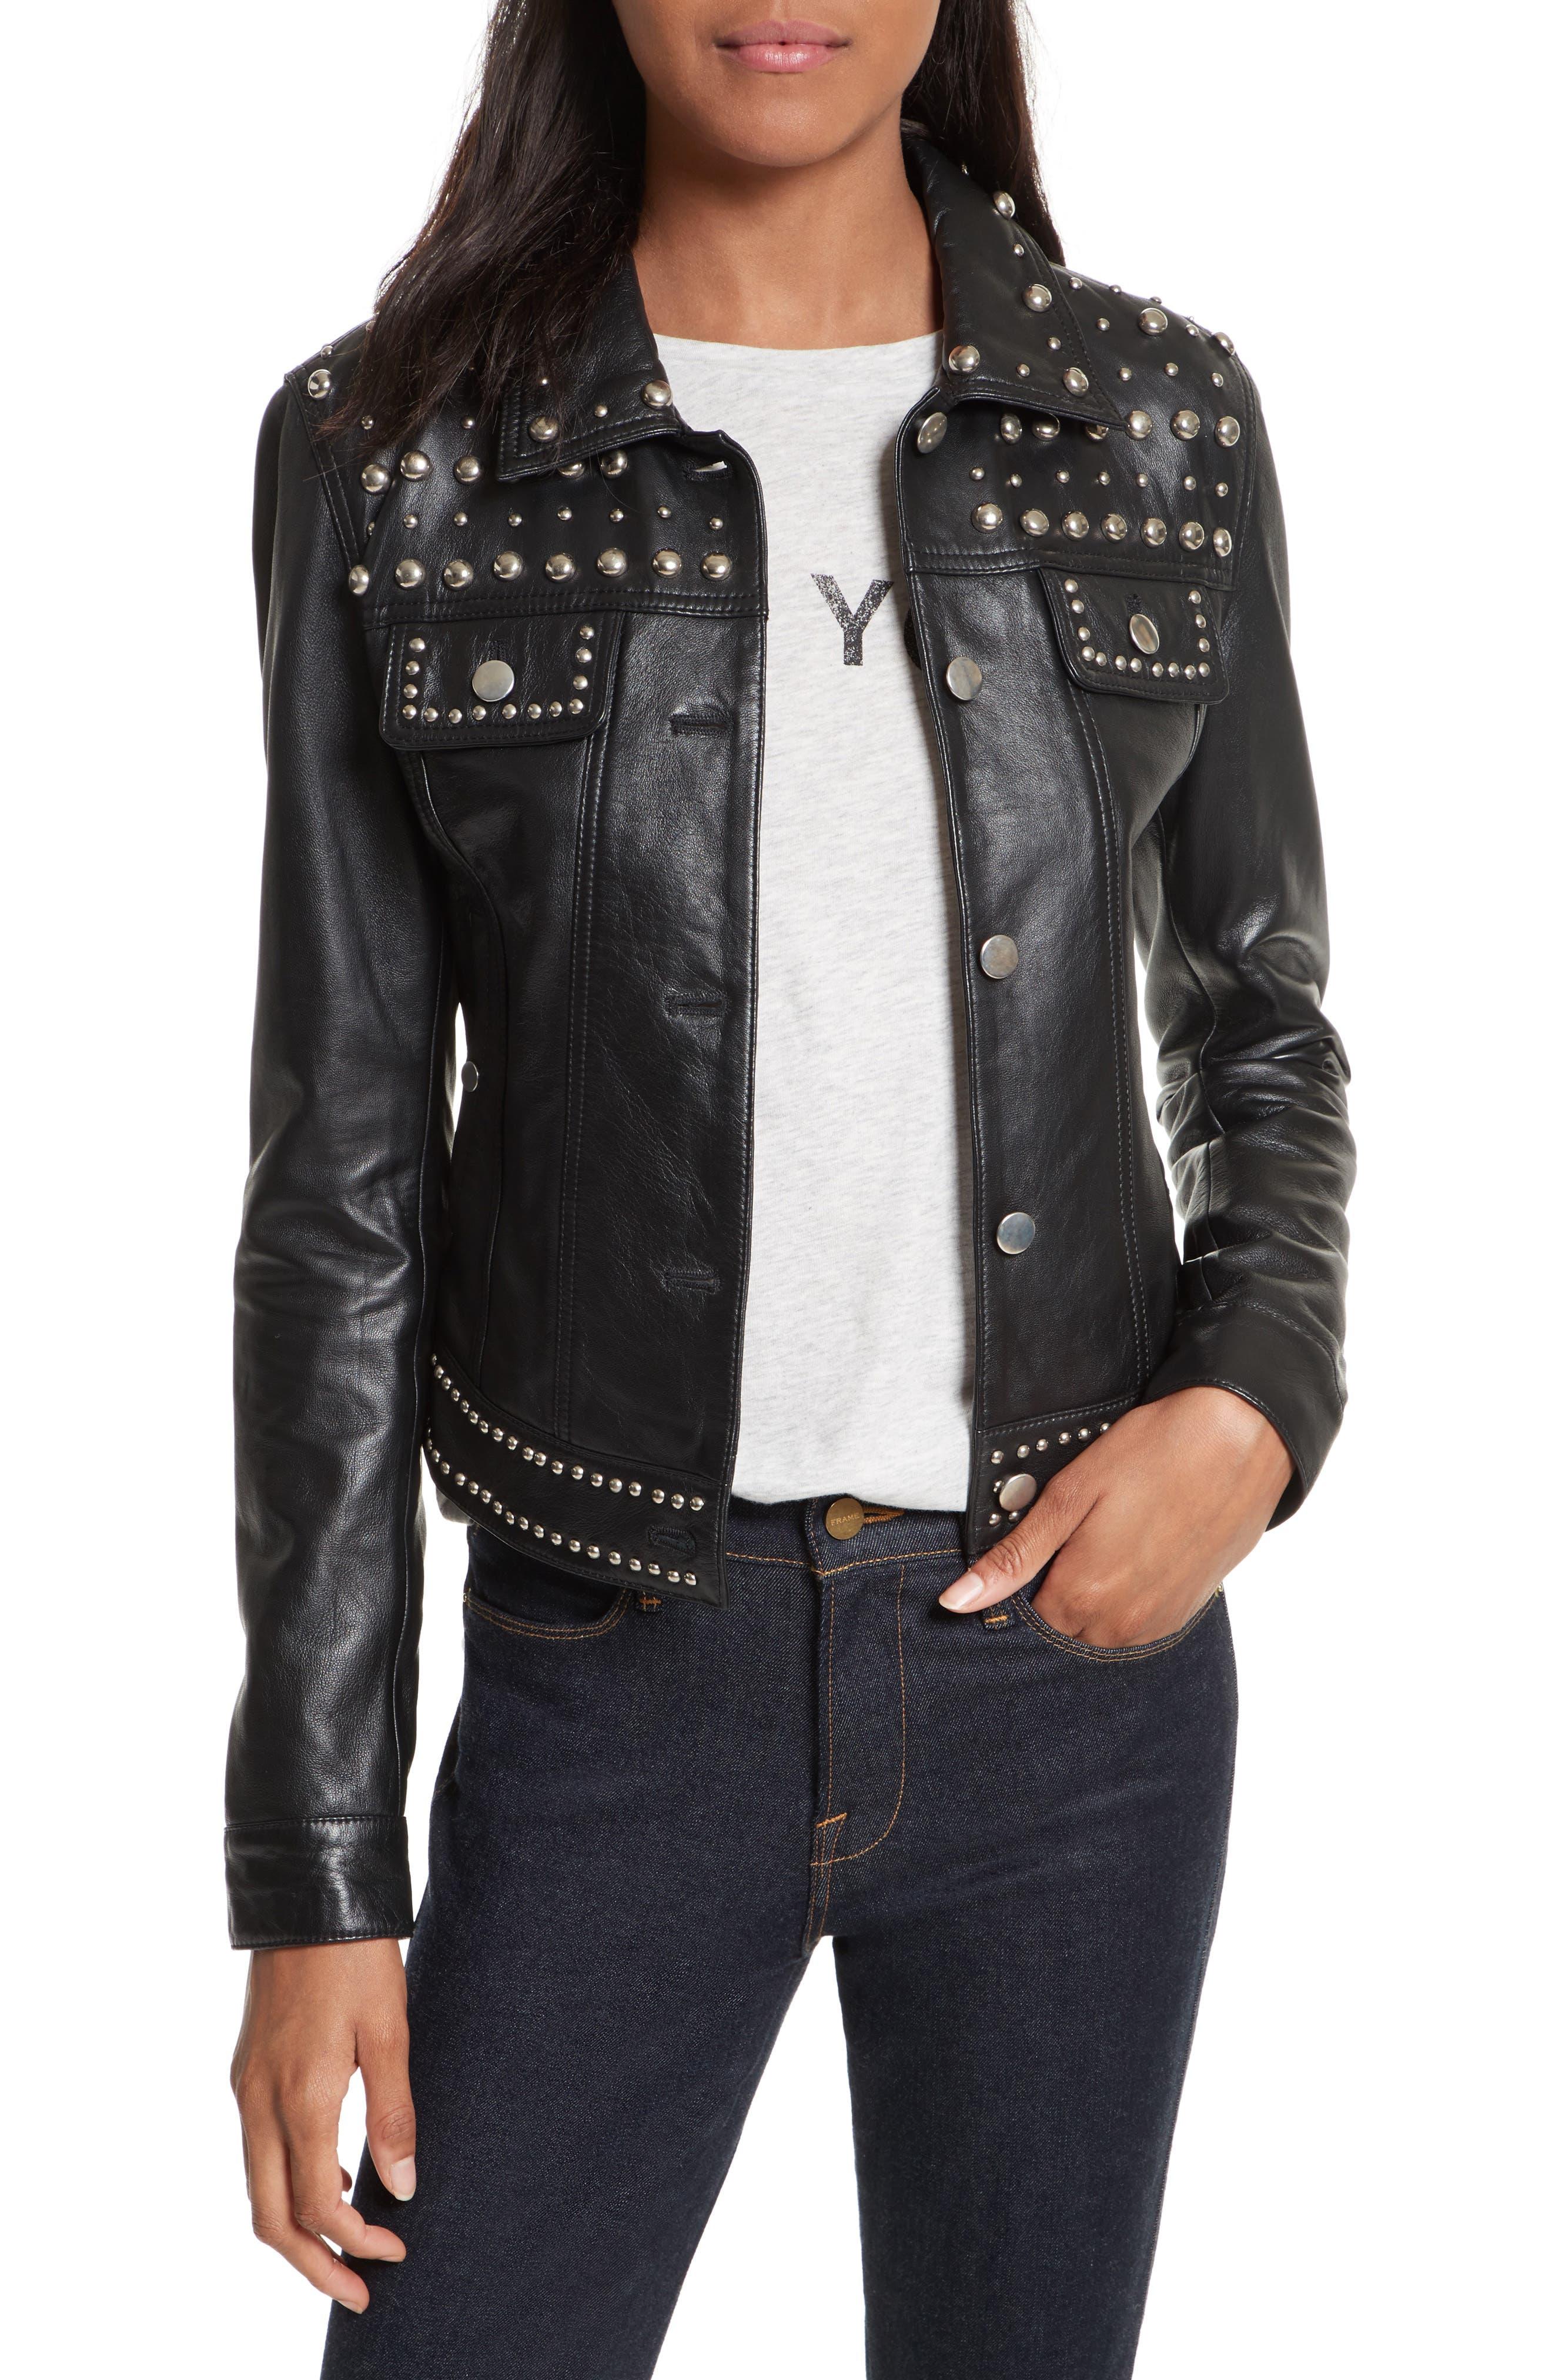 Rebecca Minkoff Annatto Leather Jacket